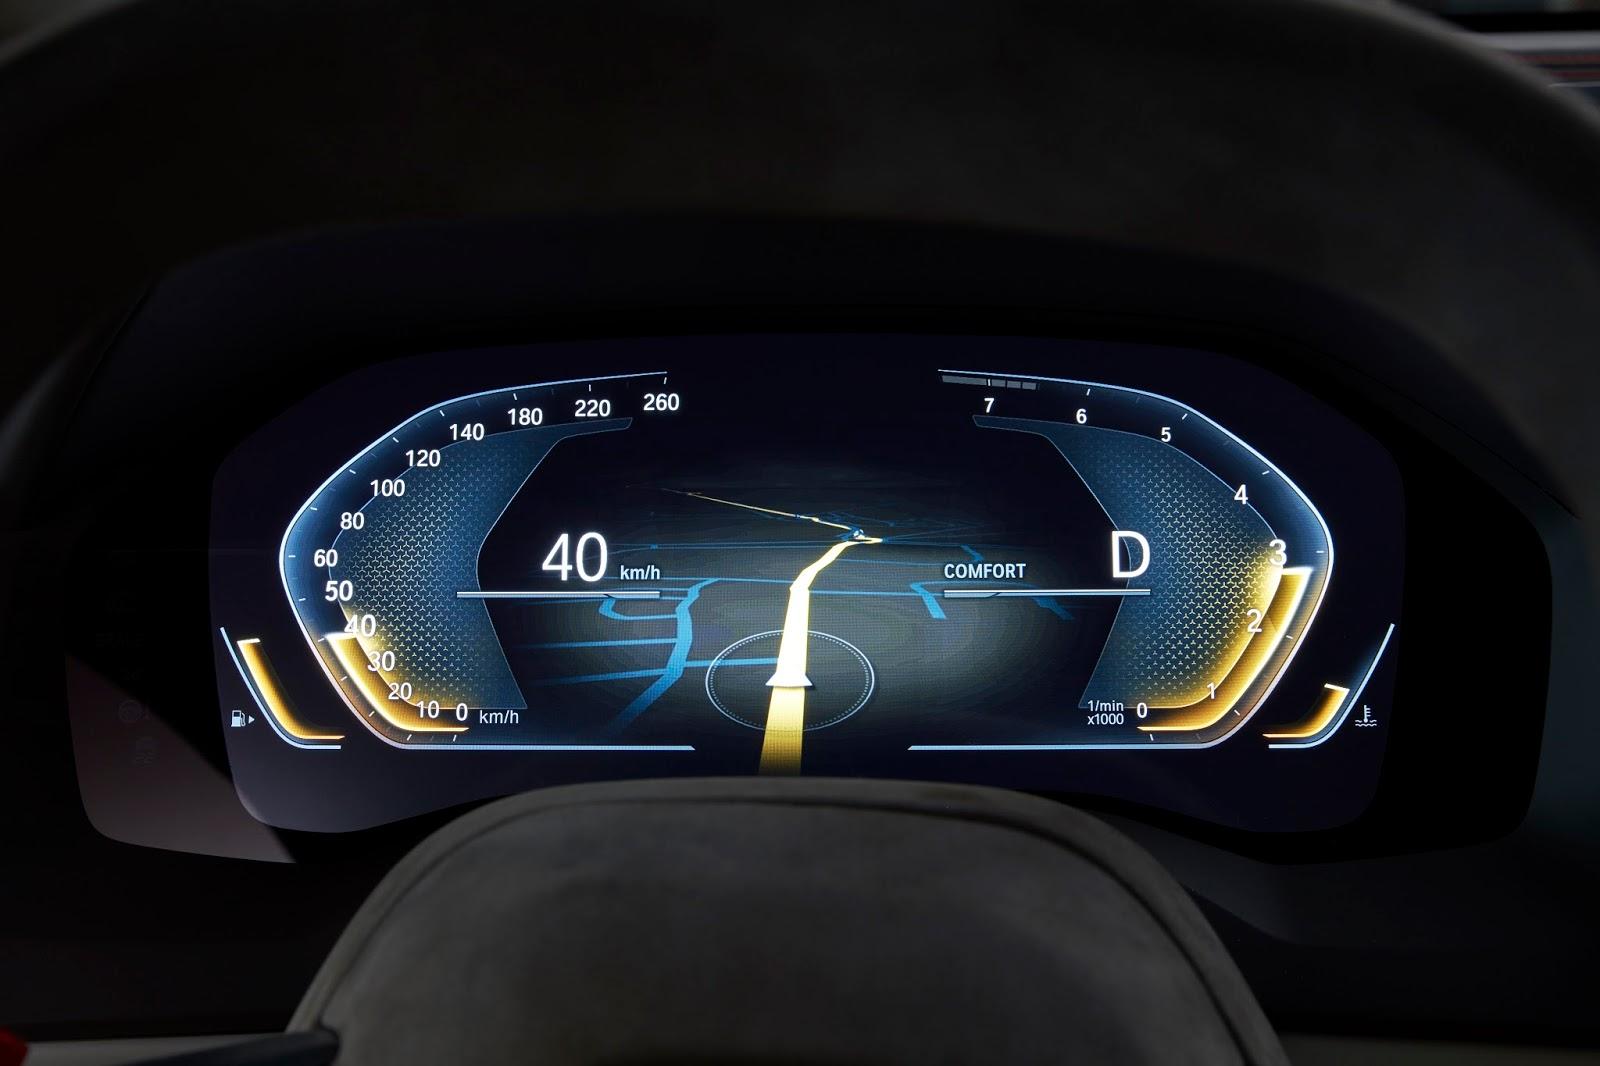 P90261138 highRes bmw concept 8 series Η BMW Σειρά 8 Coupe είναι η πεμπτουσία των μελλοντικών σπορ αυτοκινήτων BMW, BMW 8, BMW Concept, BMW Concept 8 Series, COUPE, dream car